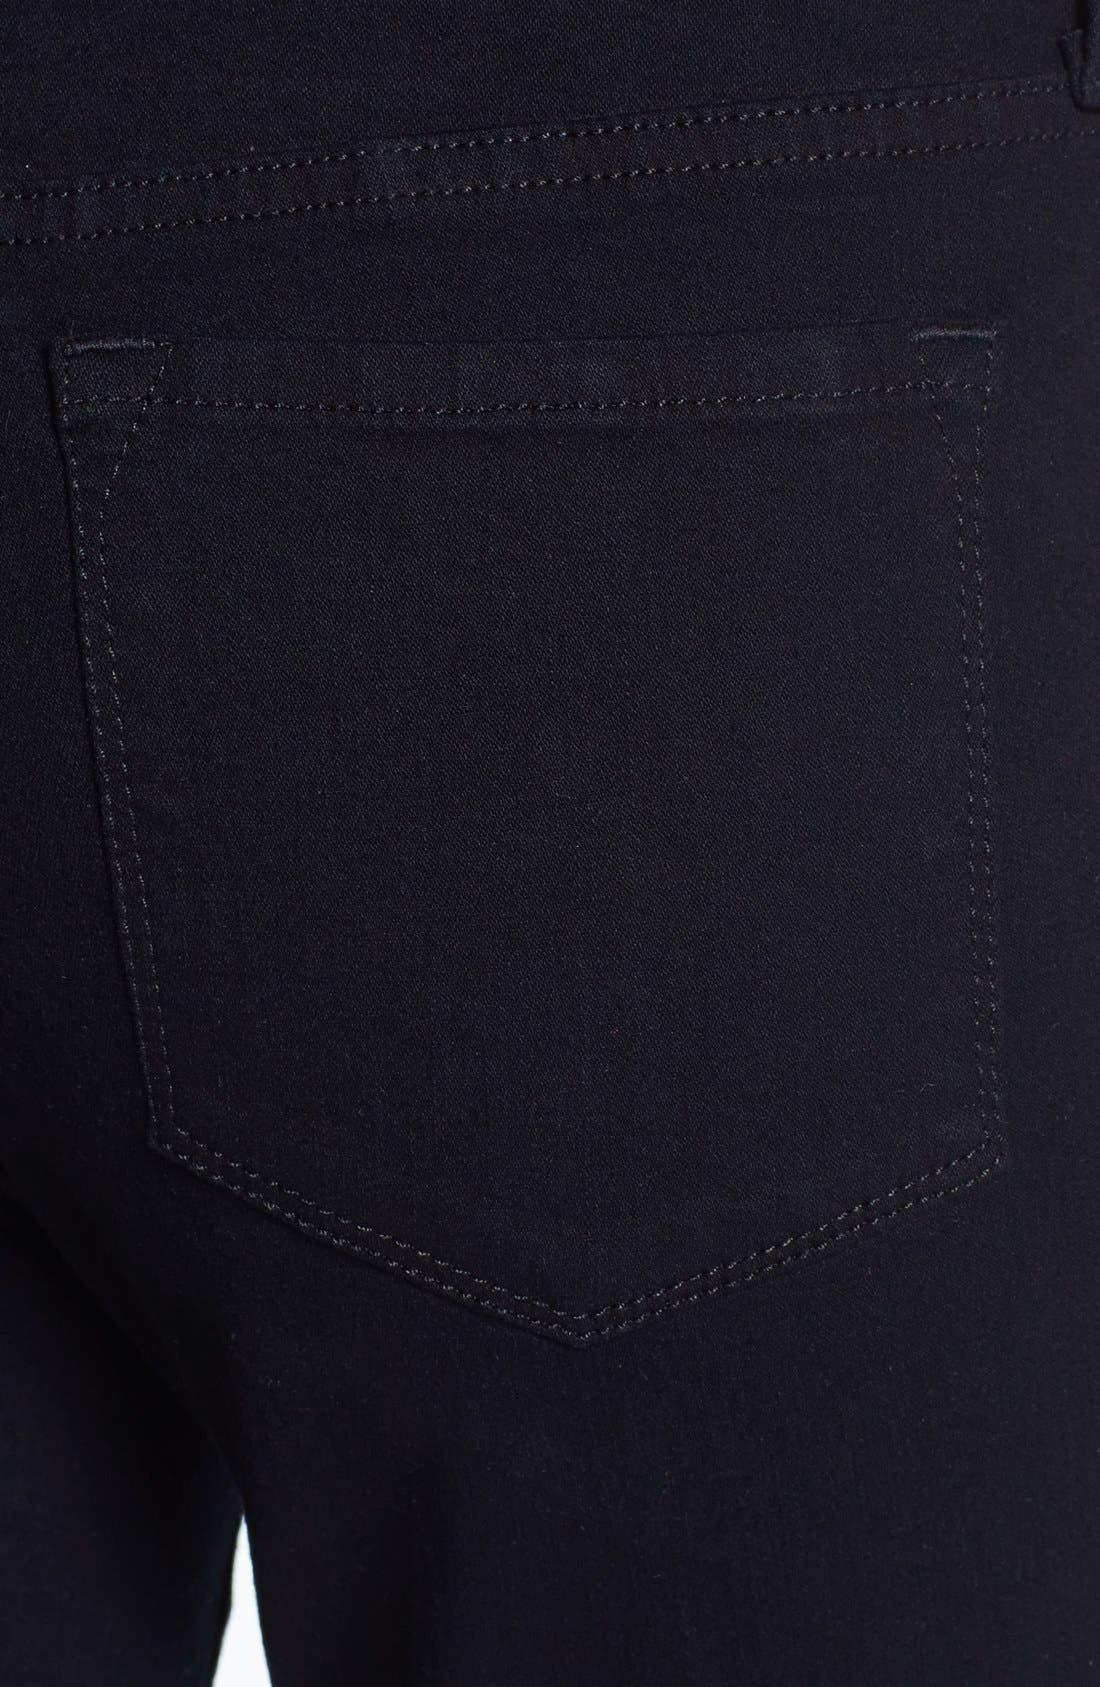 Alternate Image 3  - NYDJ 'Alina' Embellished Trim Stretch Skinny Jeans (Black)